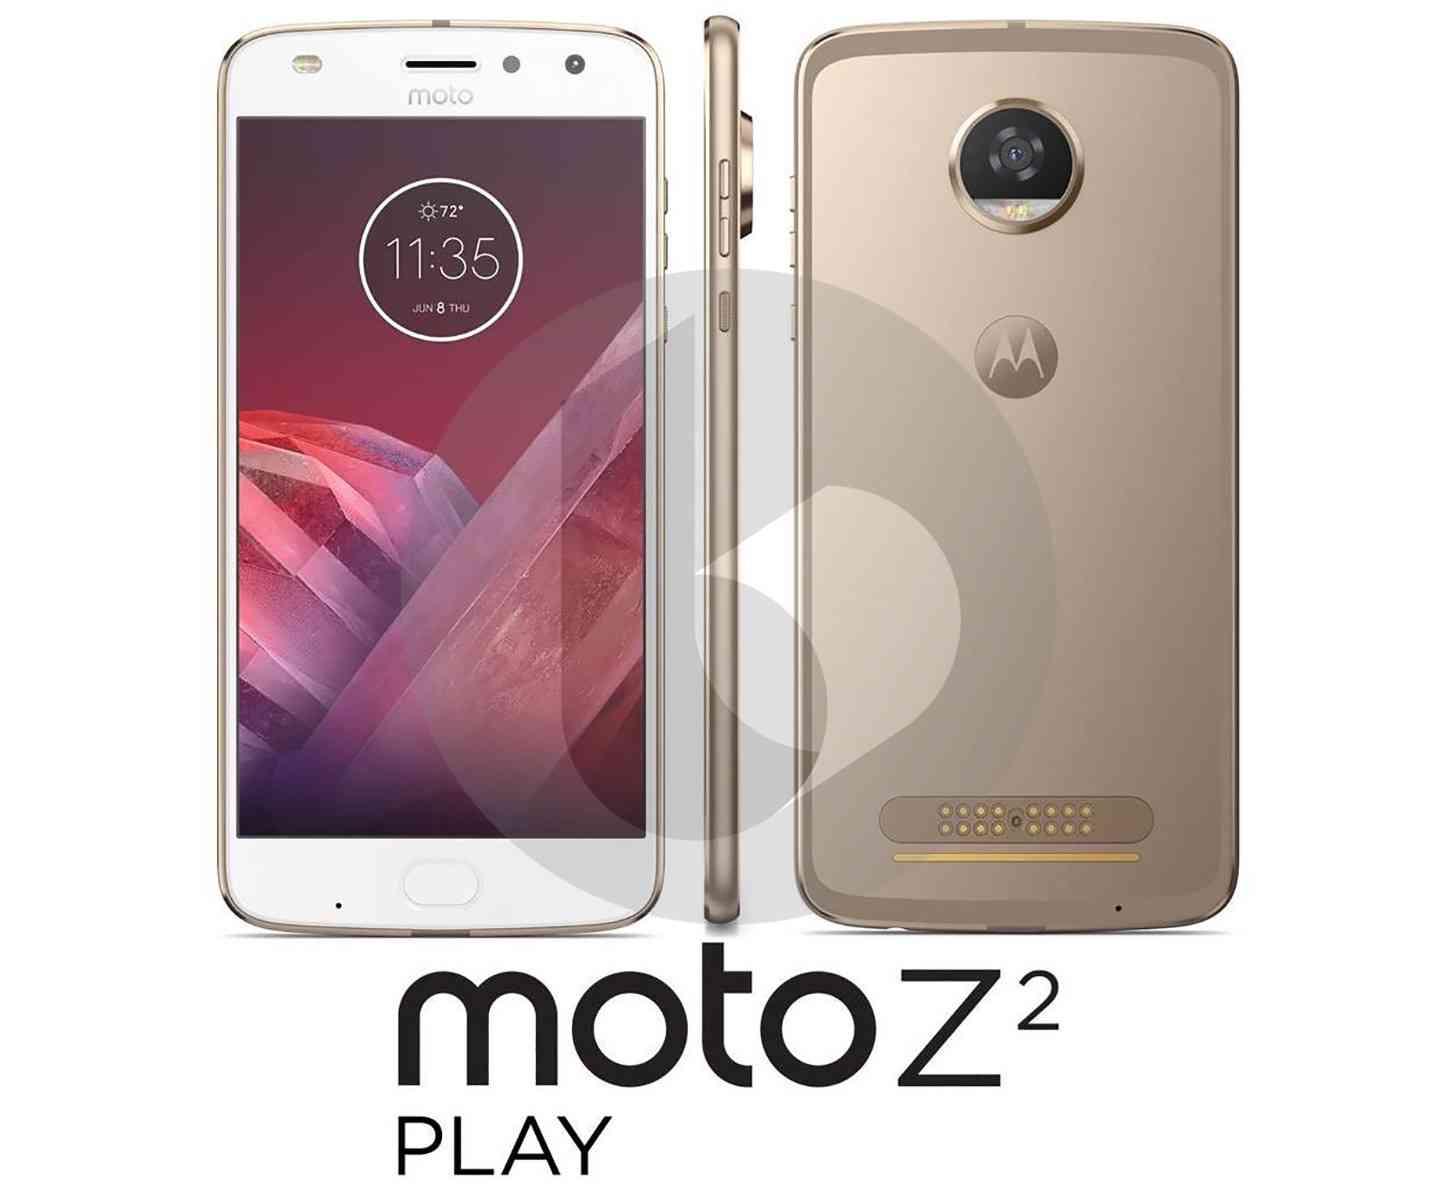 Moto Z2 Play image leak